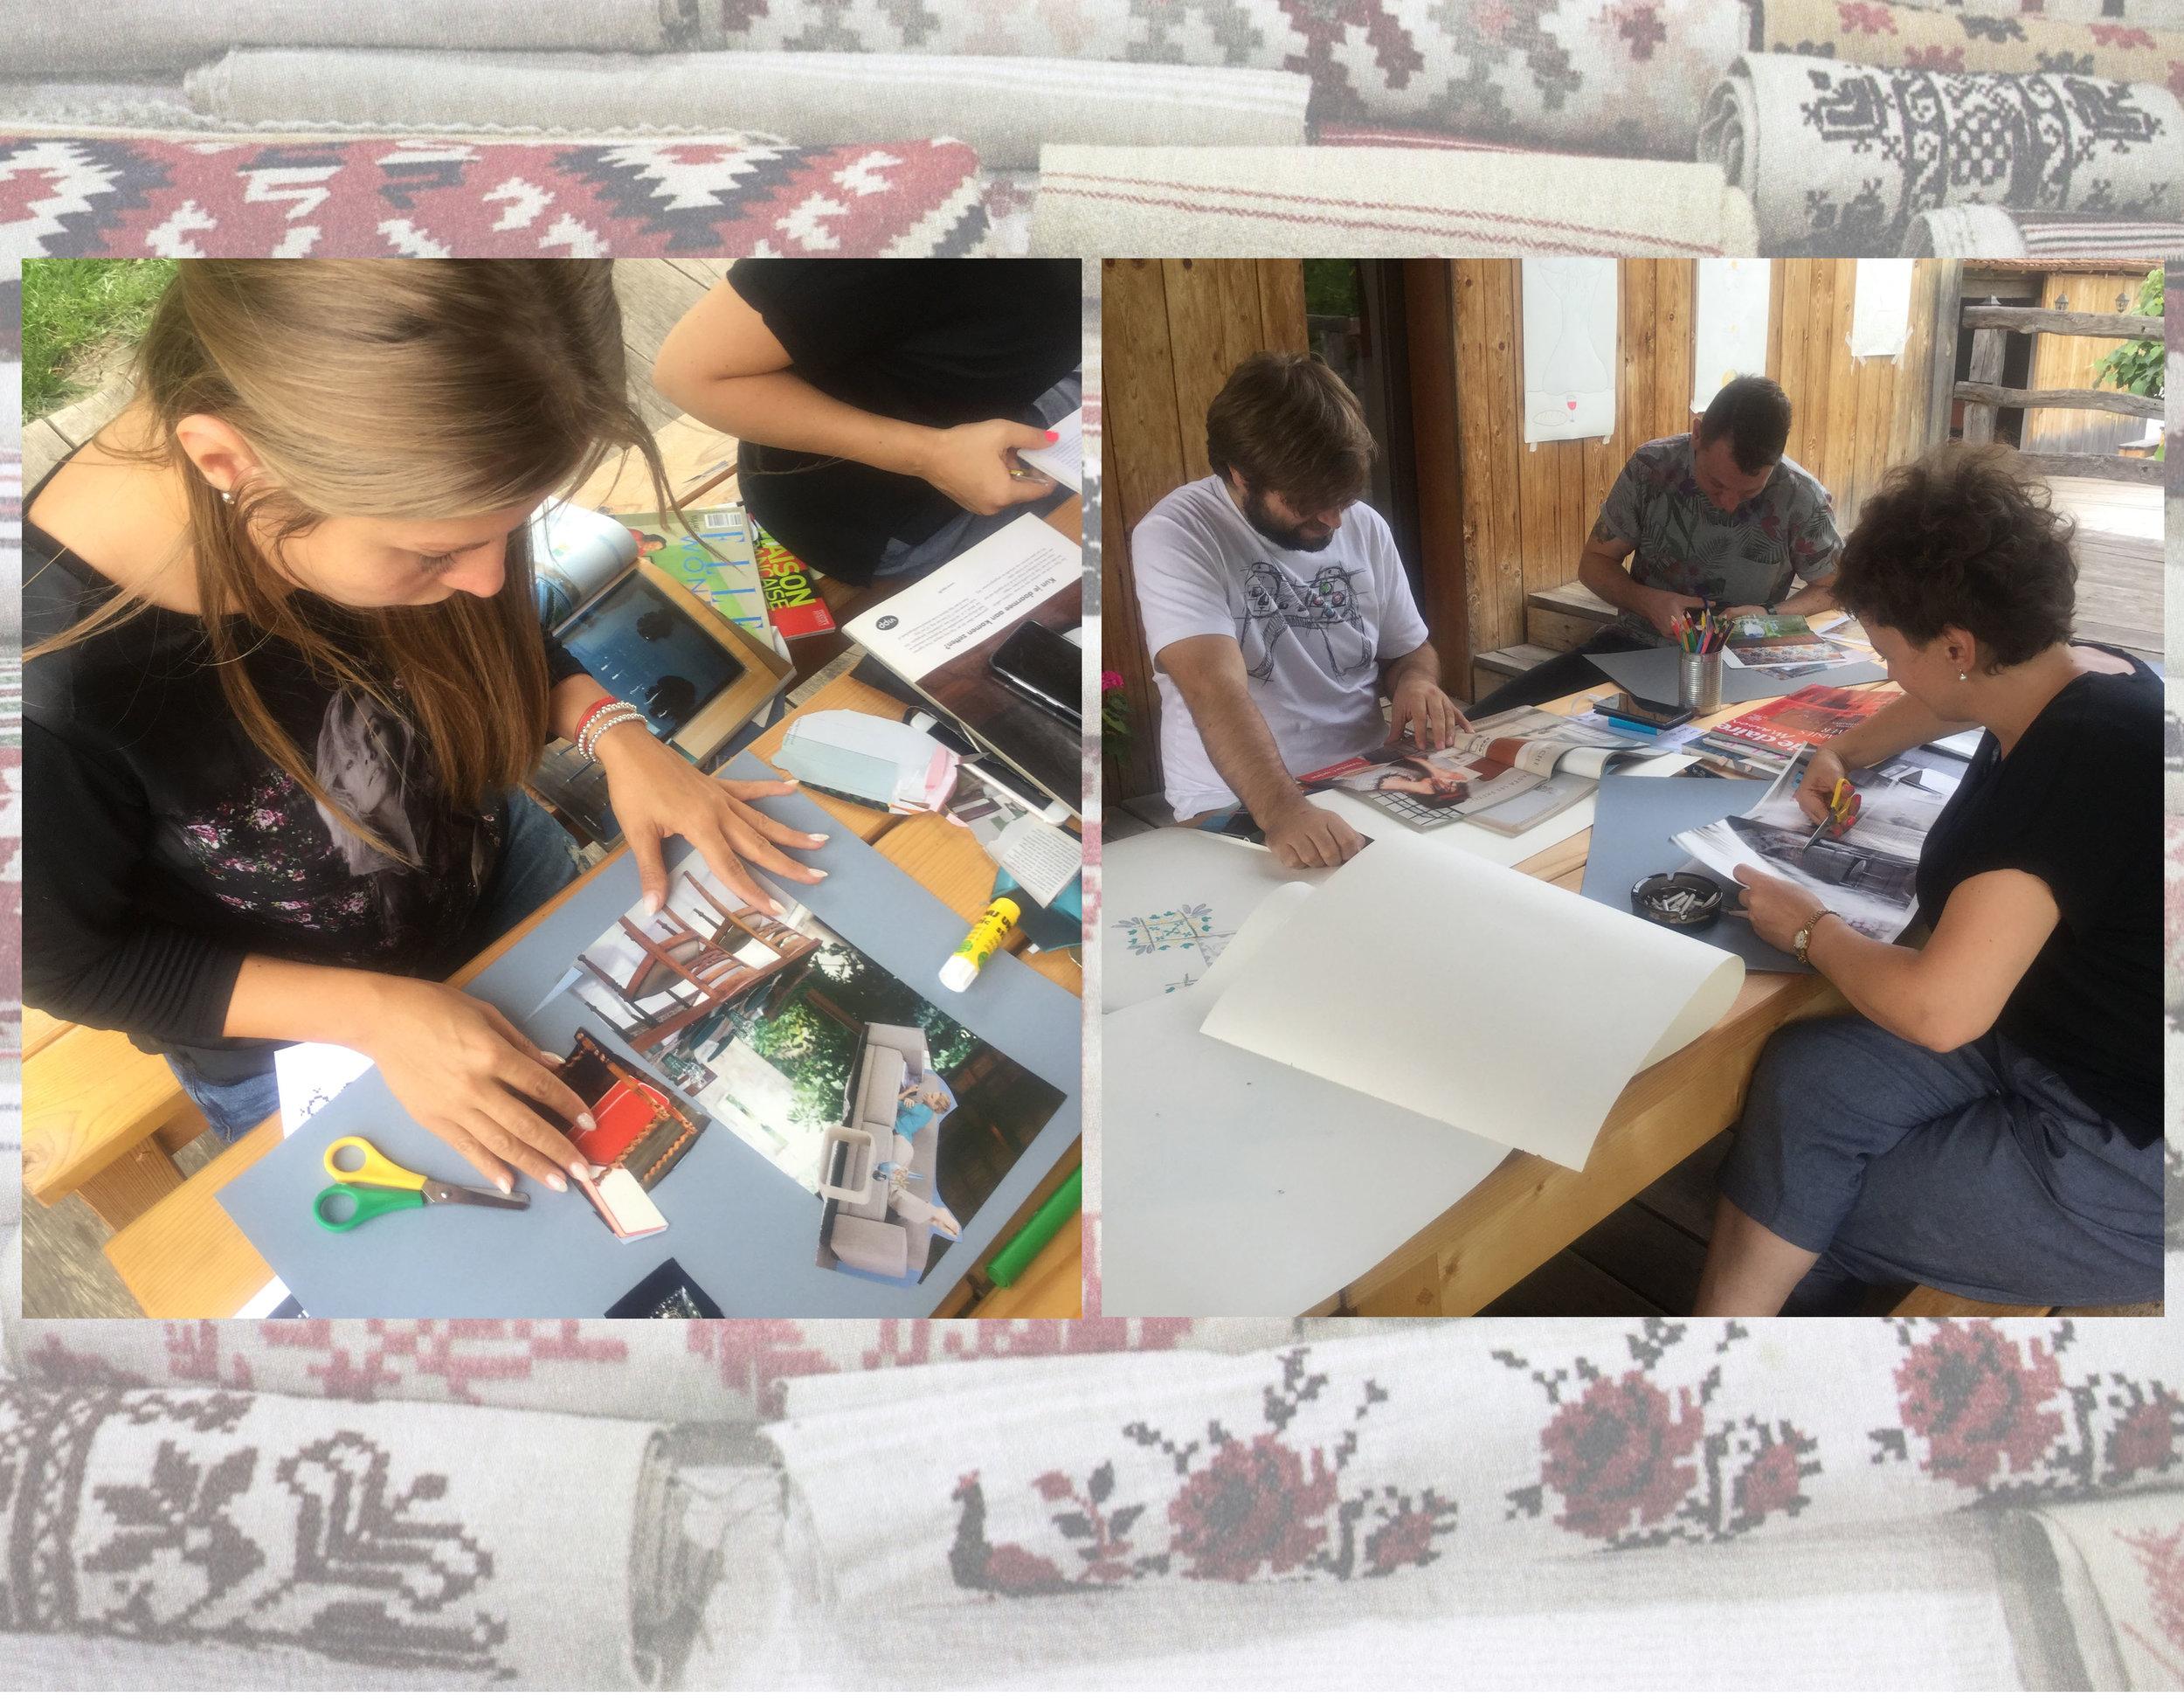 making mood boards during weekend workshop - image in the back  Muzeul Taranului Roman